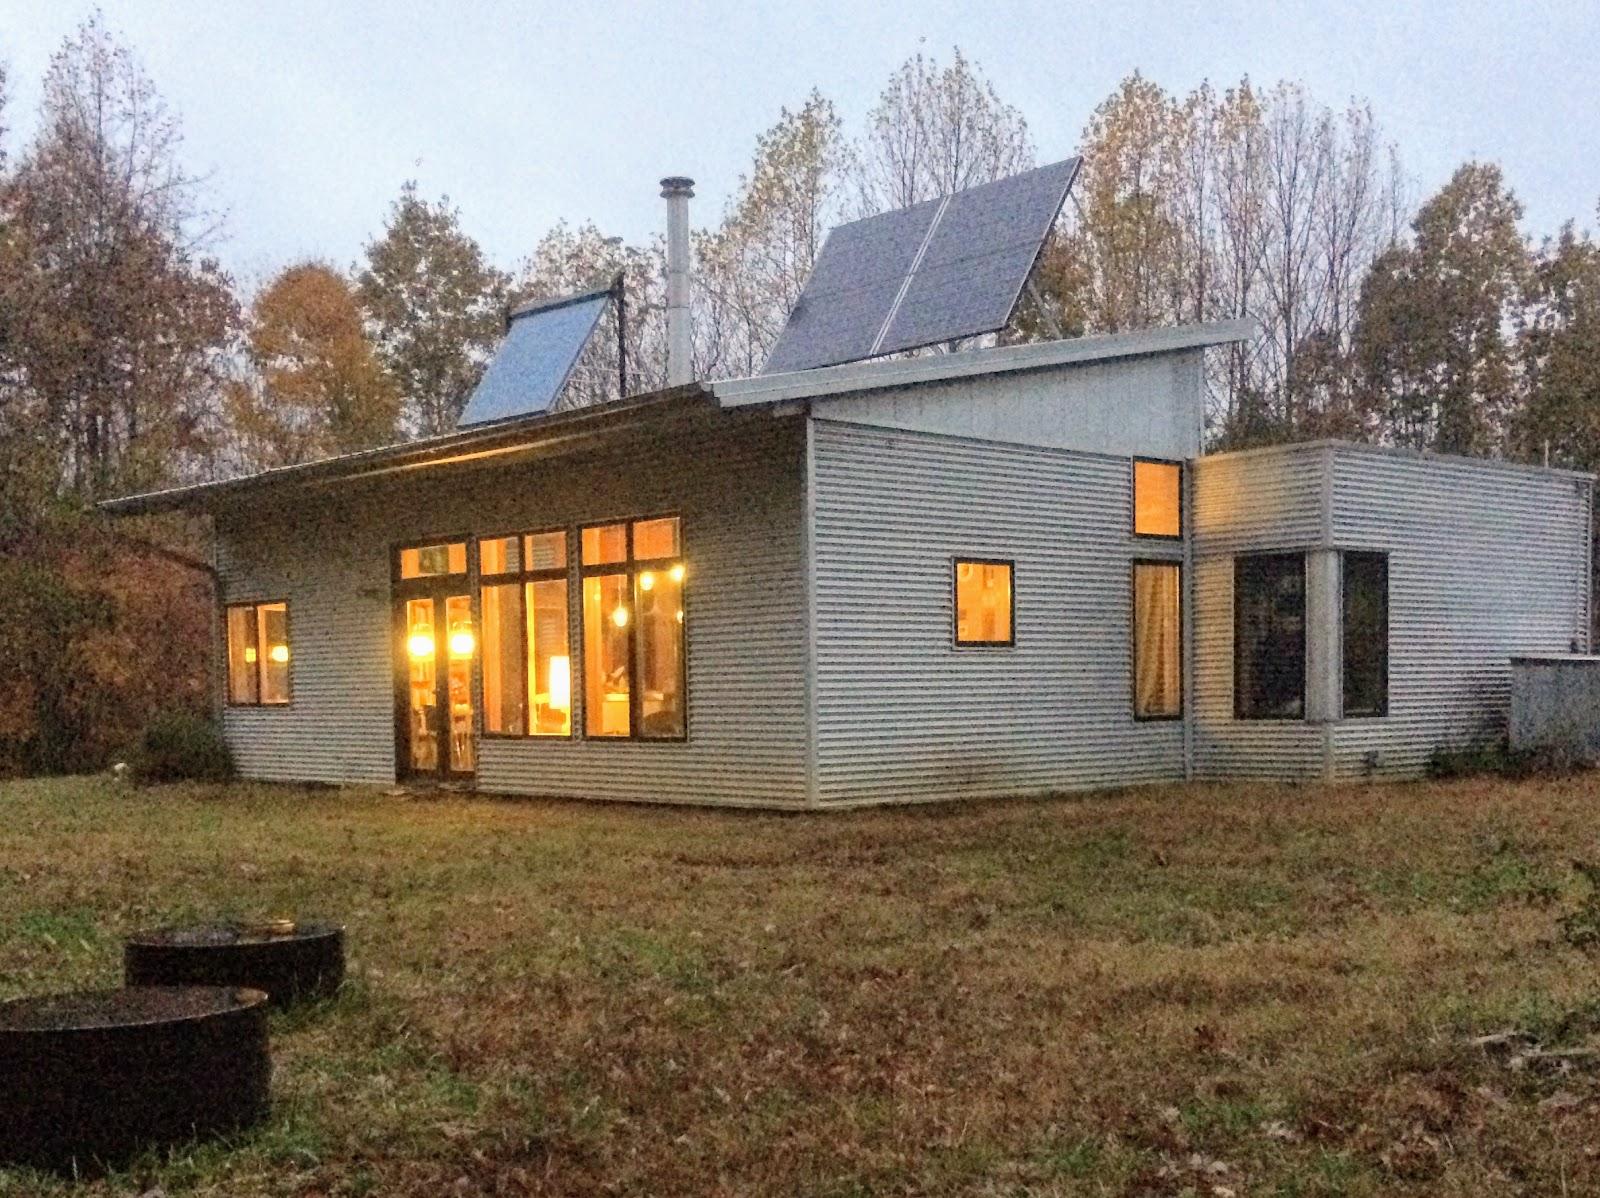 Modern Off Grid Prefab Passive Solar House On Rainwater